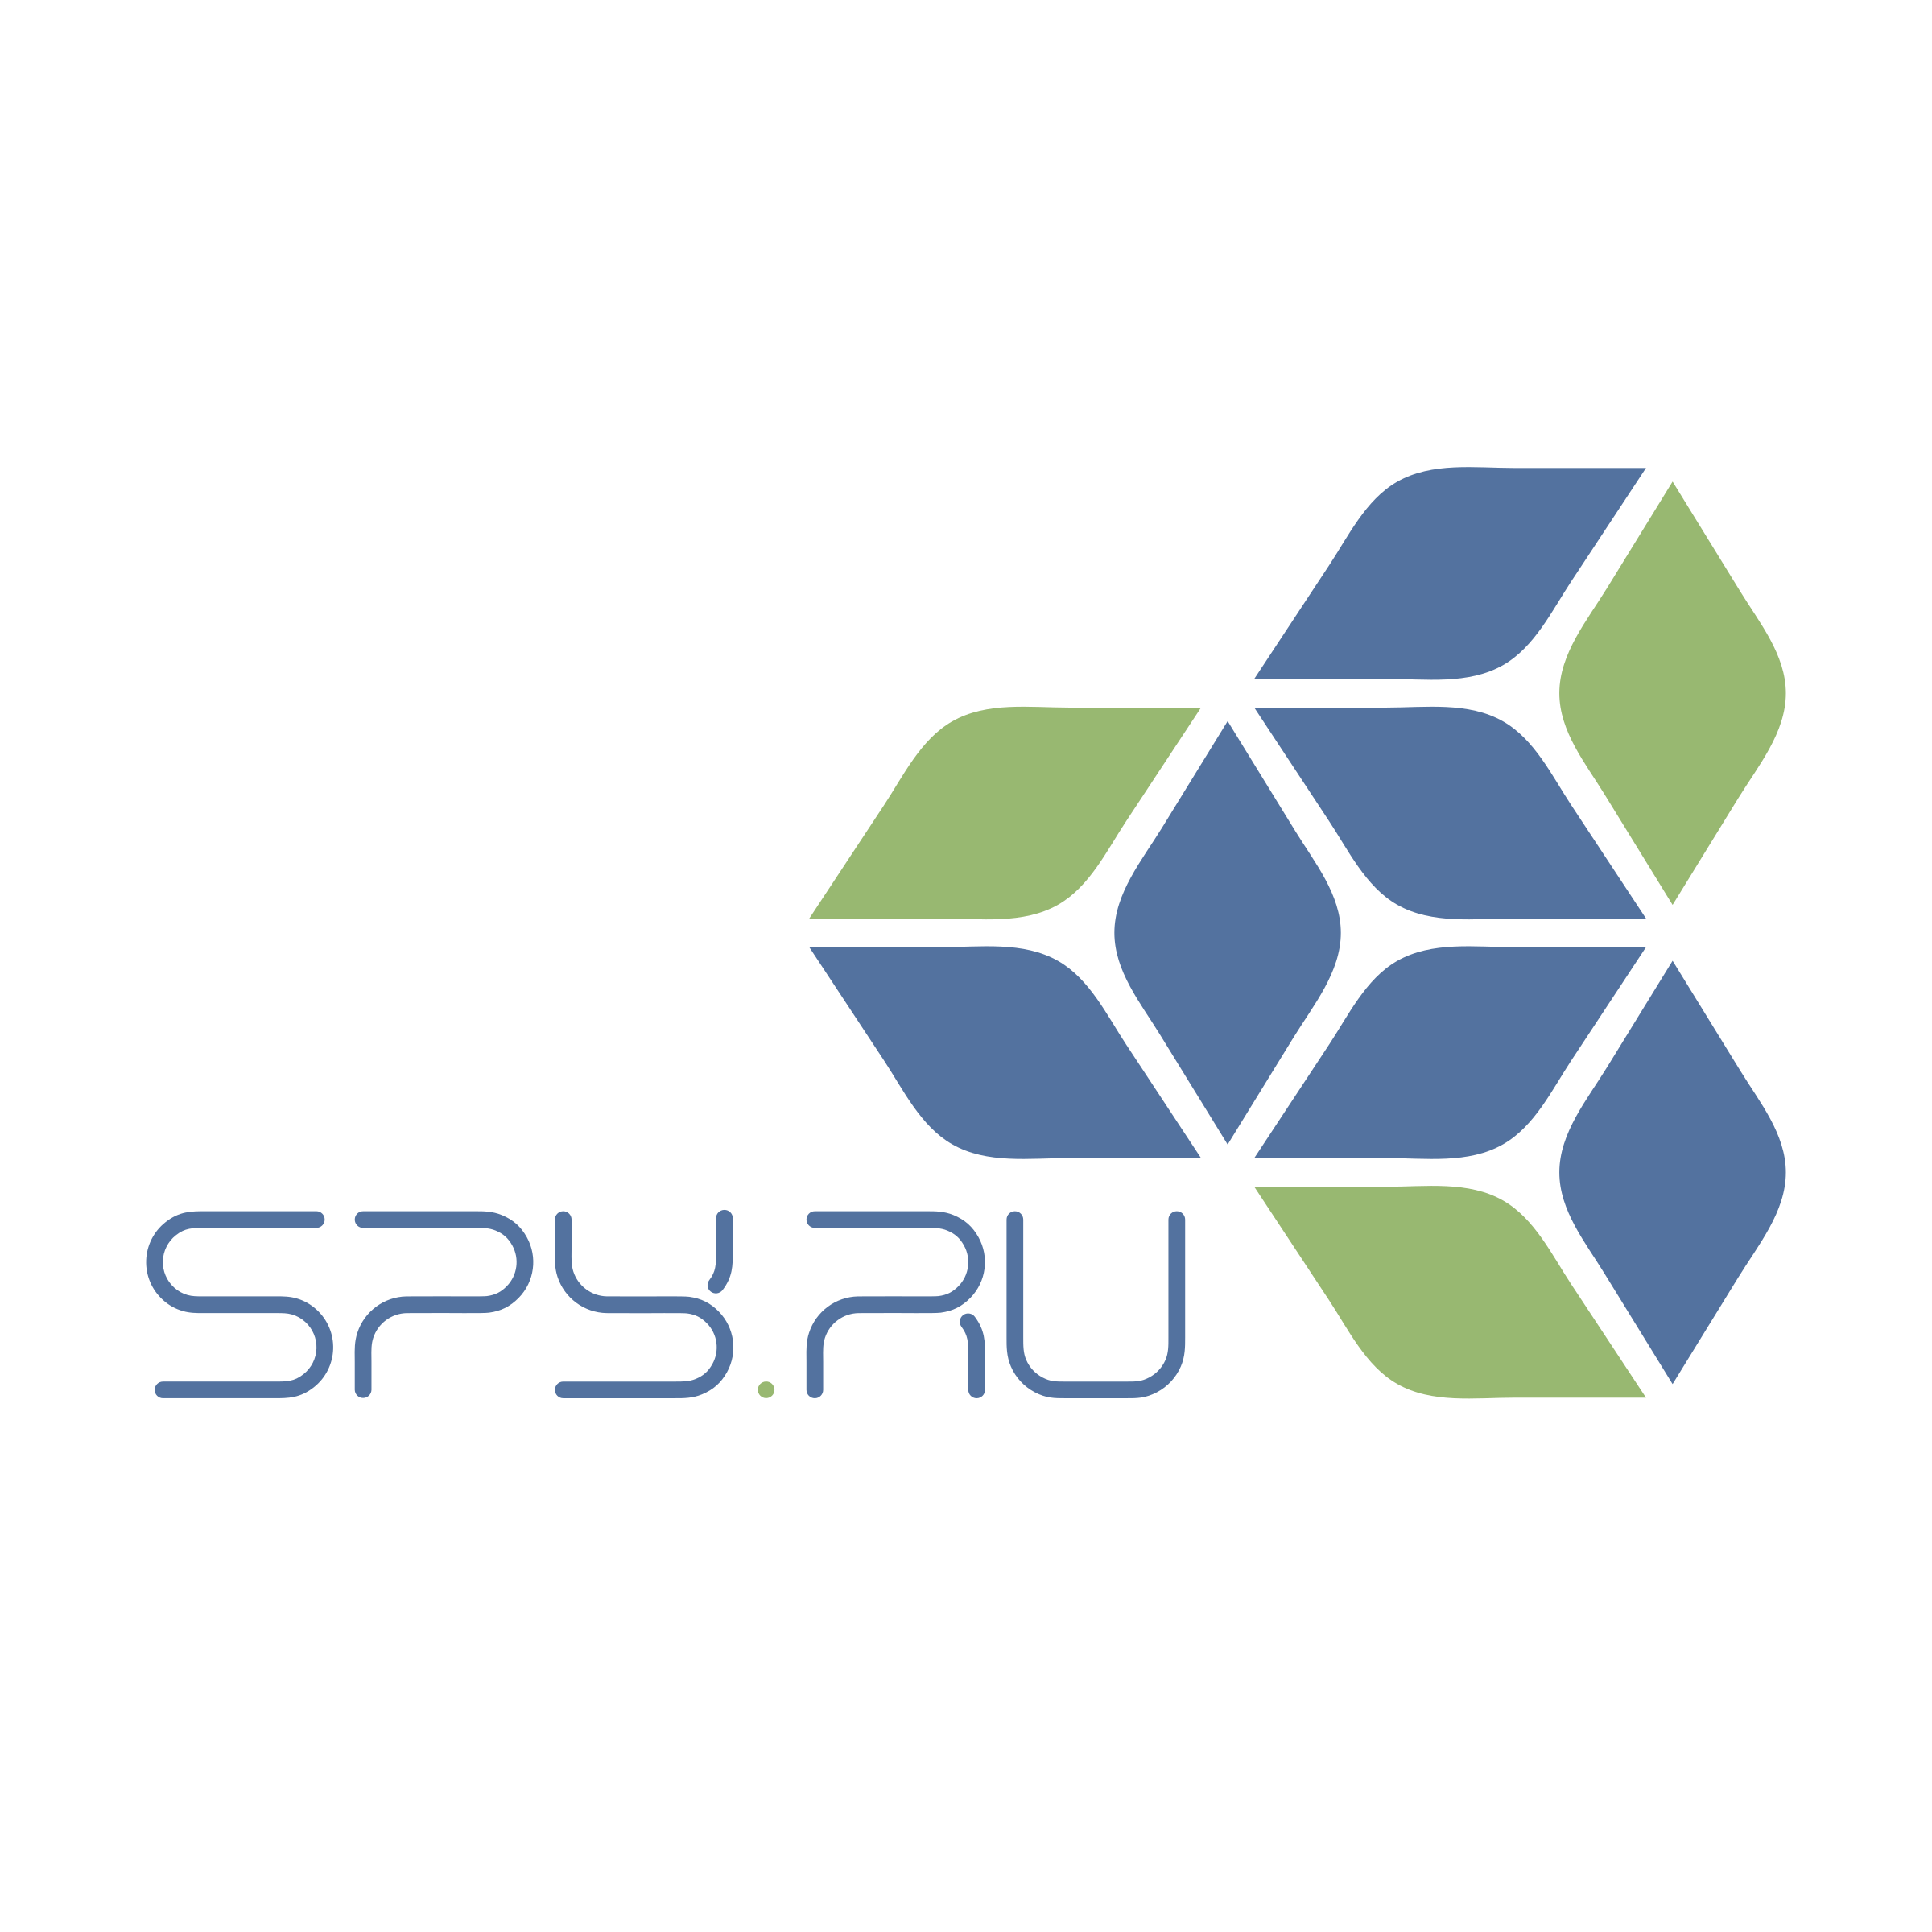 spy visual communications logo png transparent svg vector freebie supply spy visual communications logo png